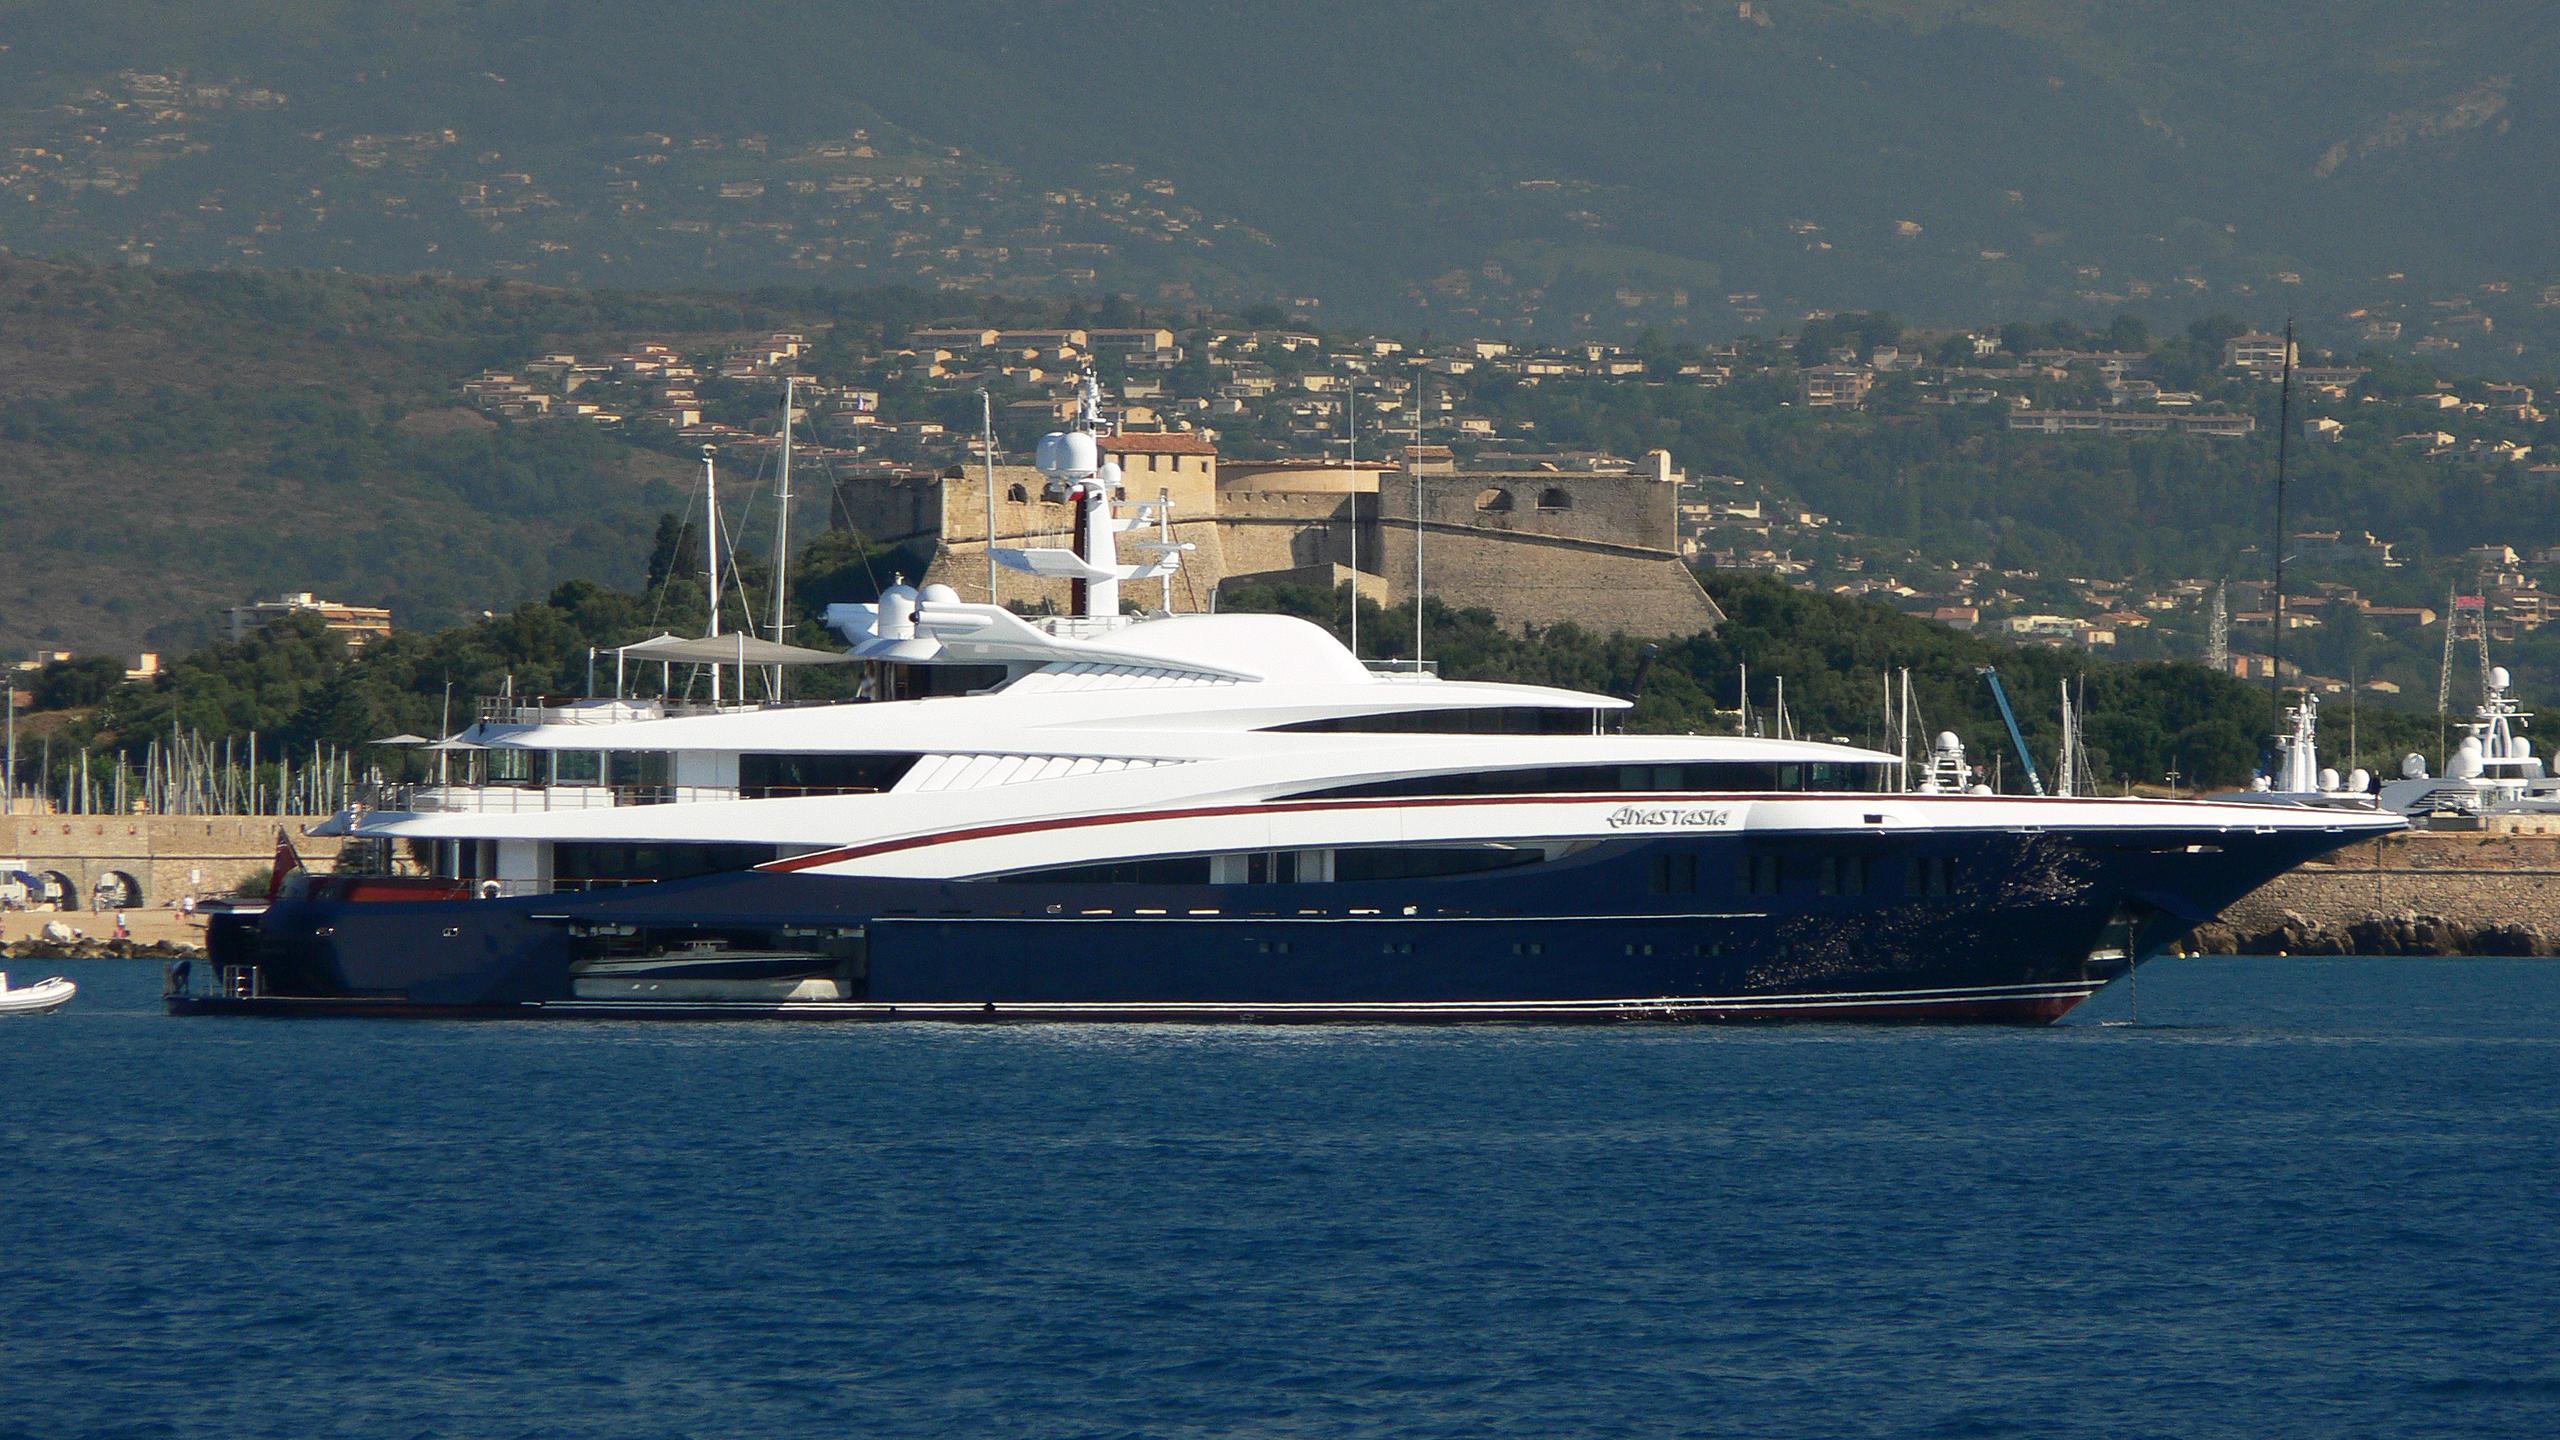 anastasia-motor-yacht-oceanco-2008-75m-profile